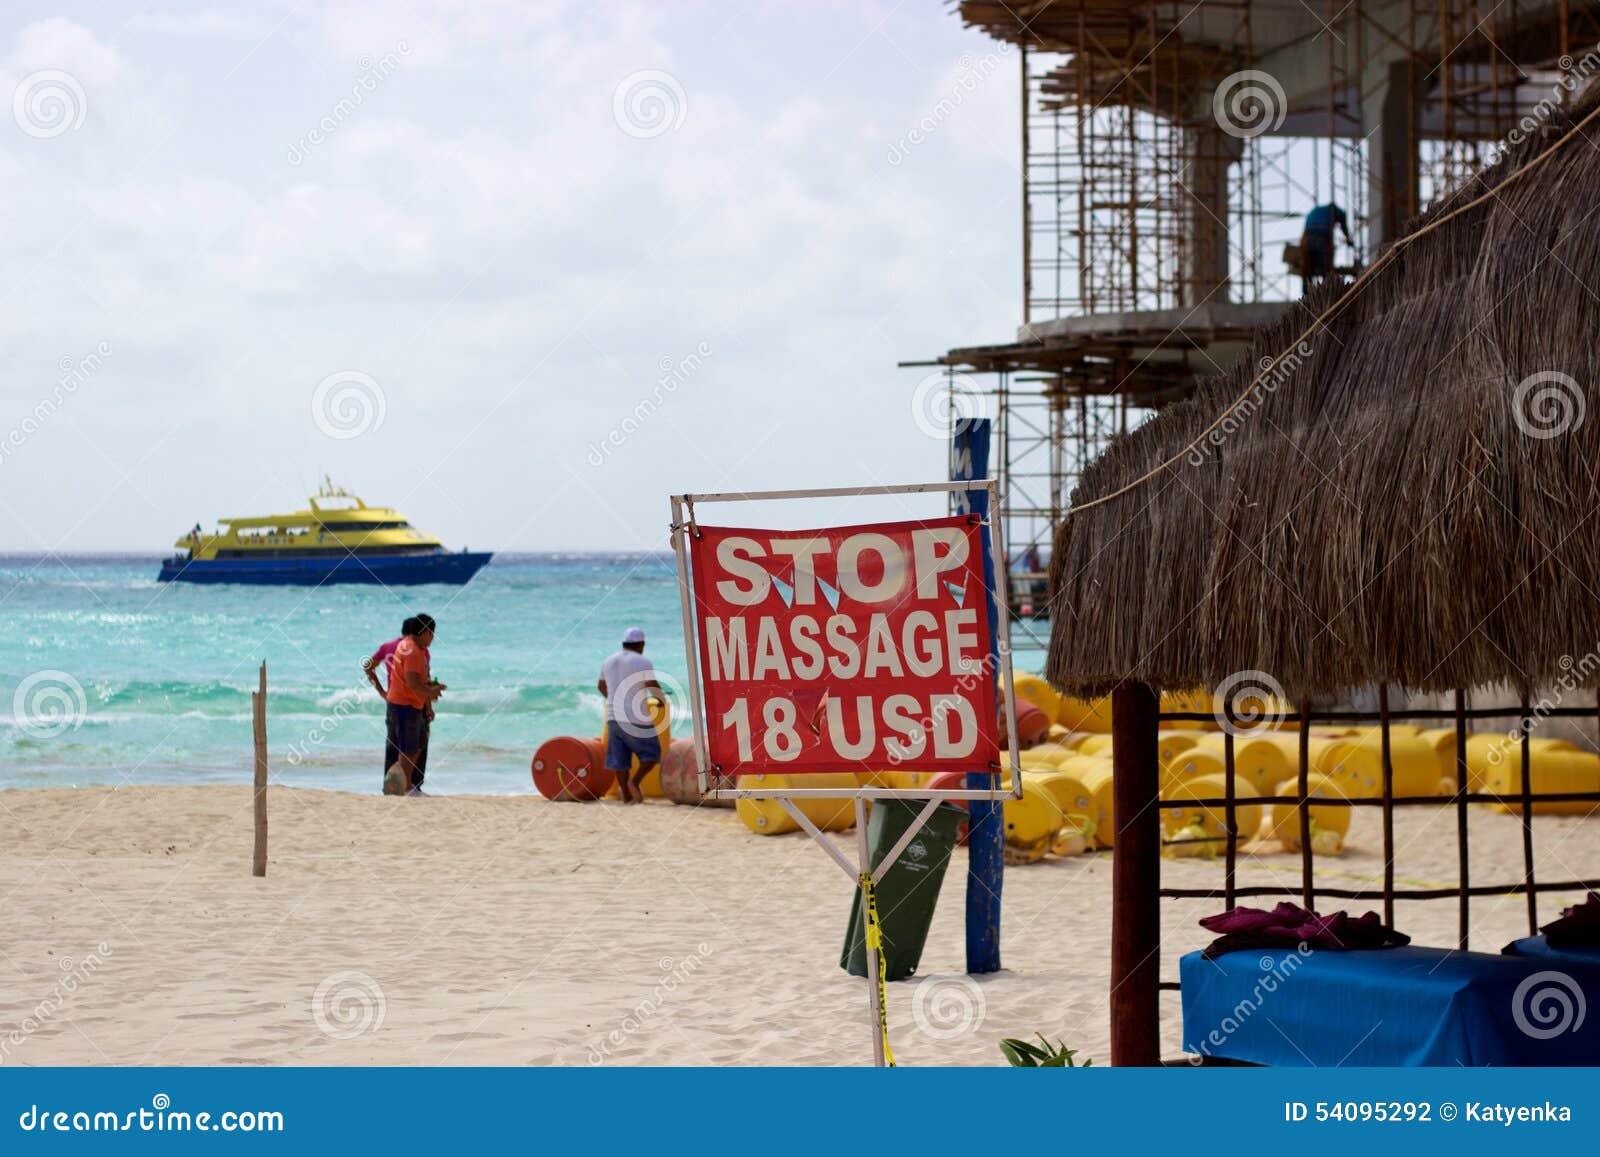 Best Sea Food Restaurant In Playa Del Carmen